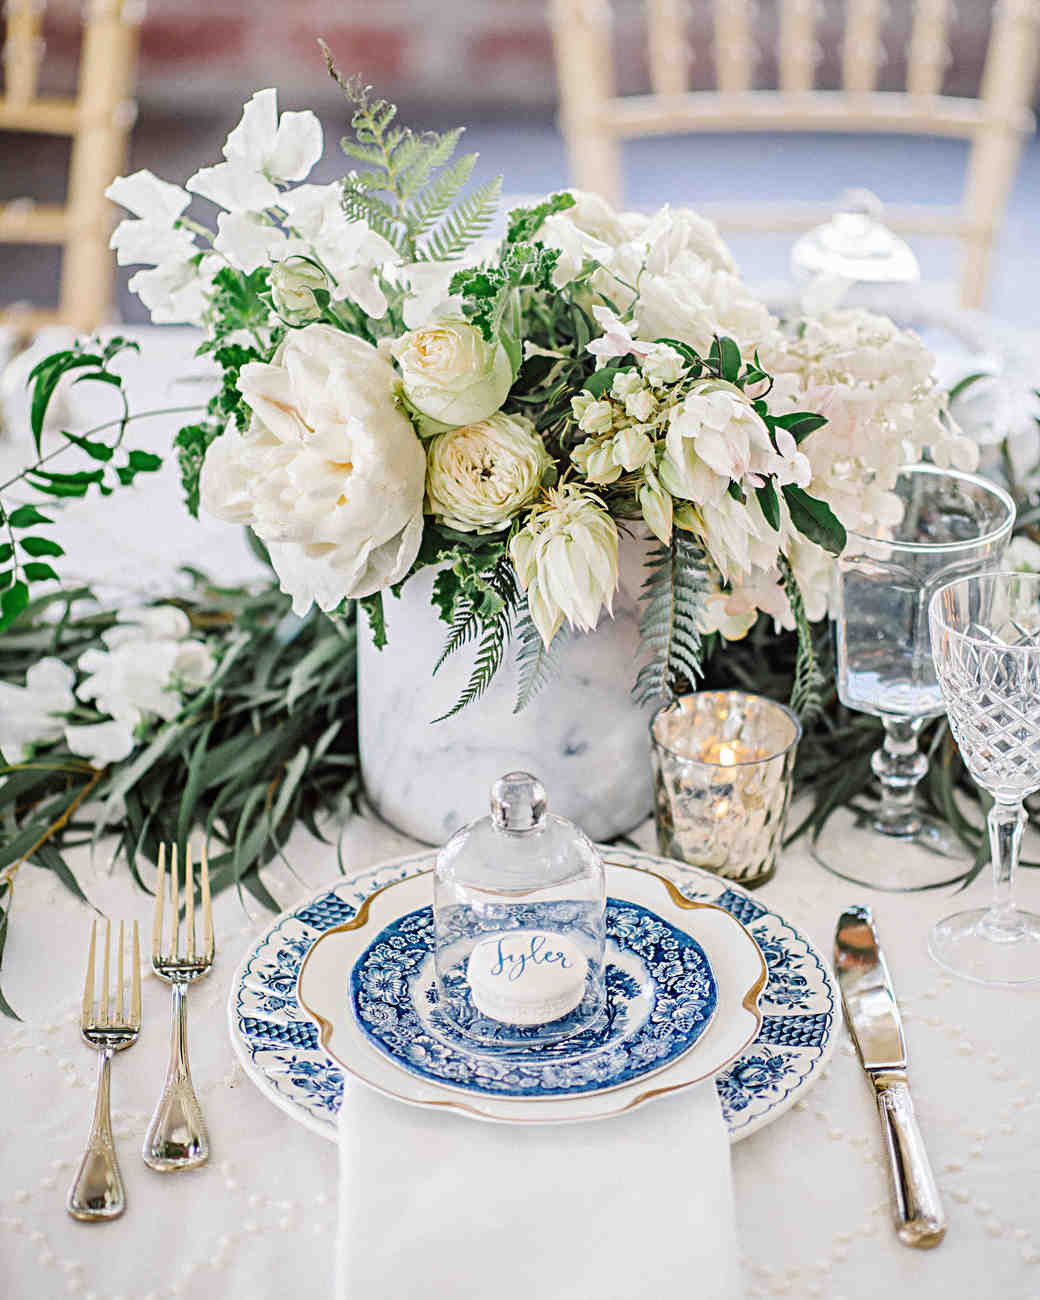 24 pilsner vase wholesale of 79 white wedding centerpieces martha stewart weddings pertaining to hannah steve wedding california china macarons